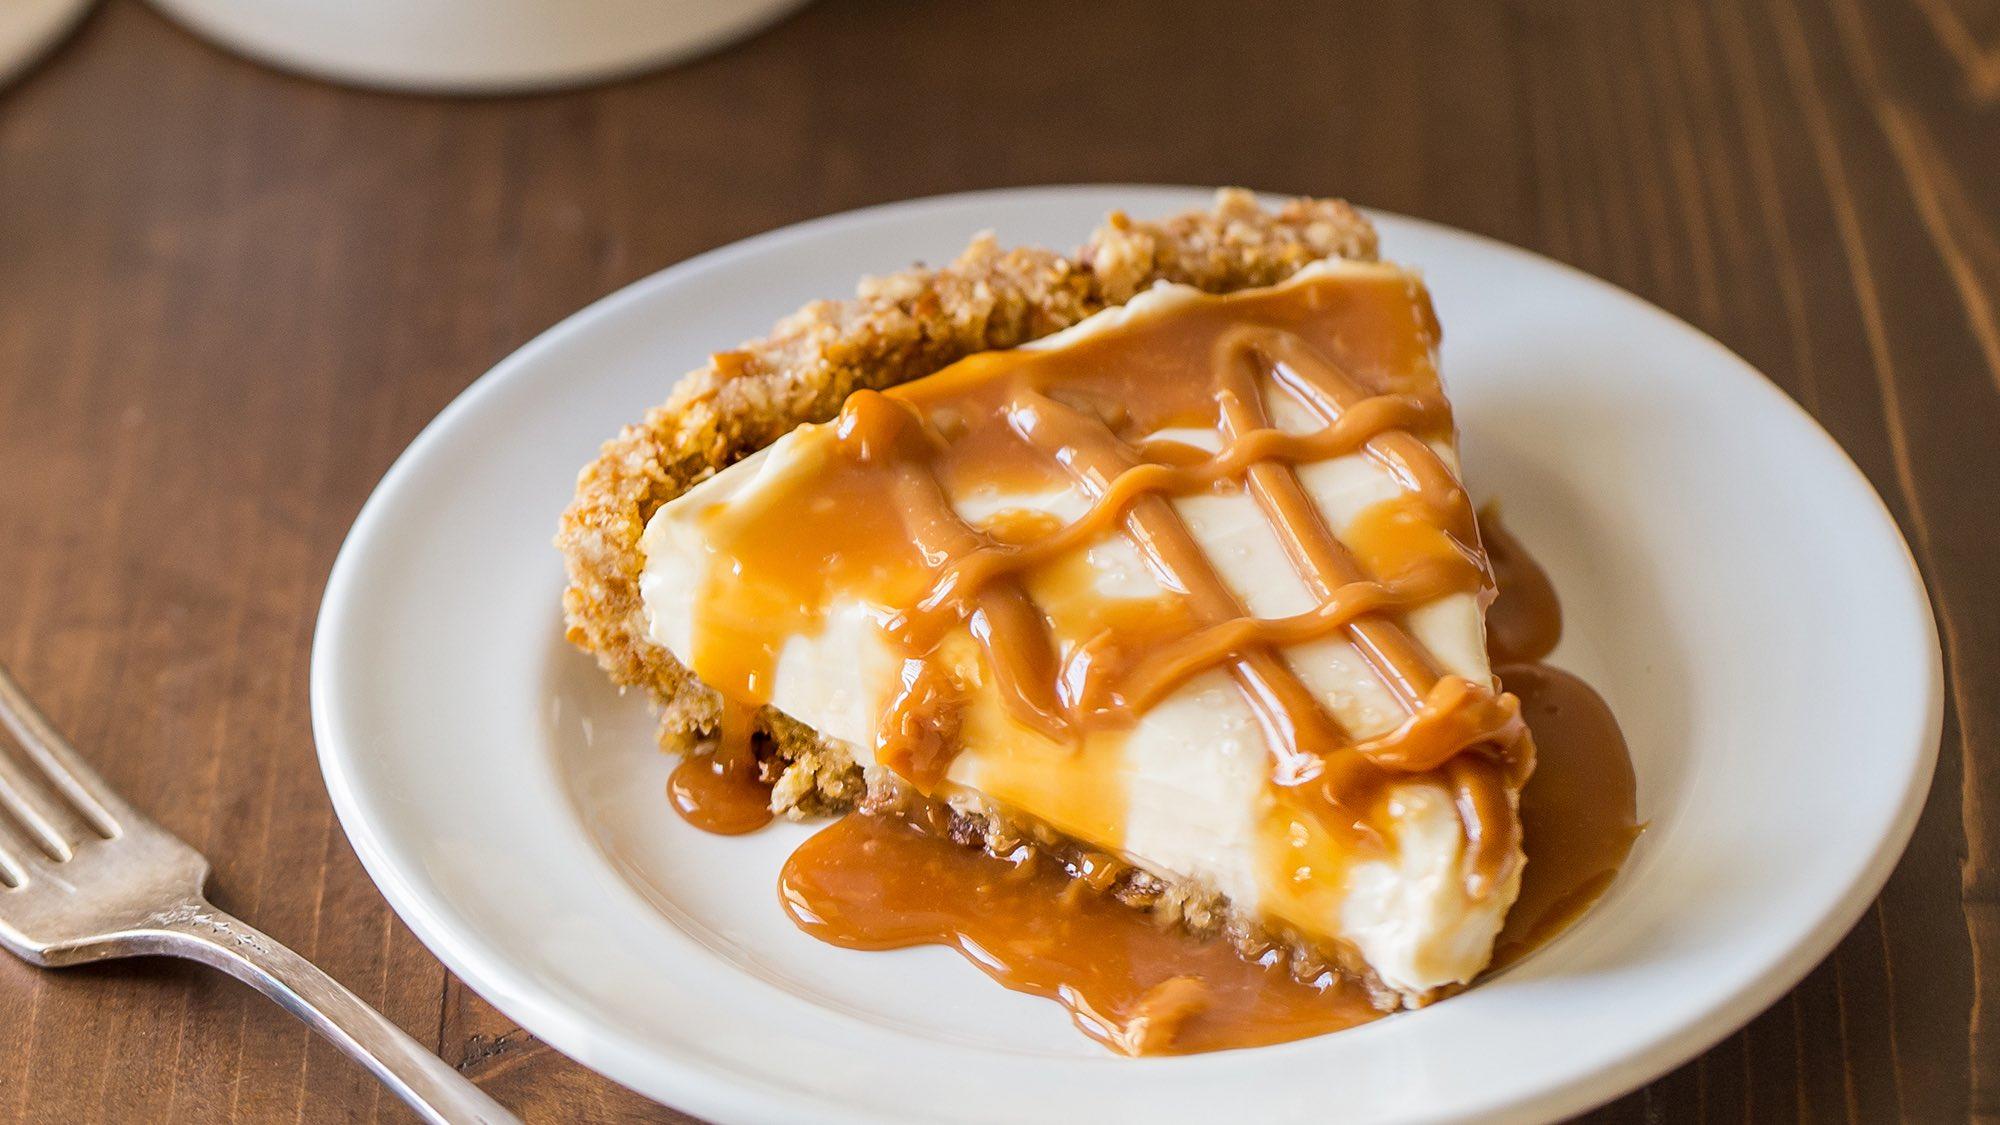 McCormick Salted Caramel Pie